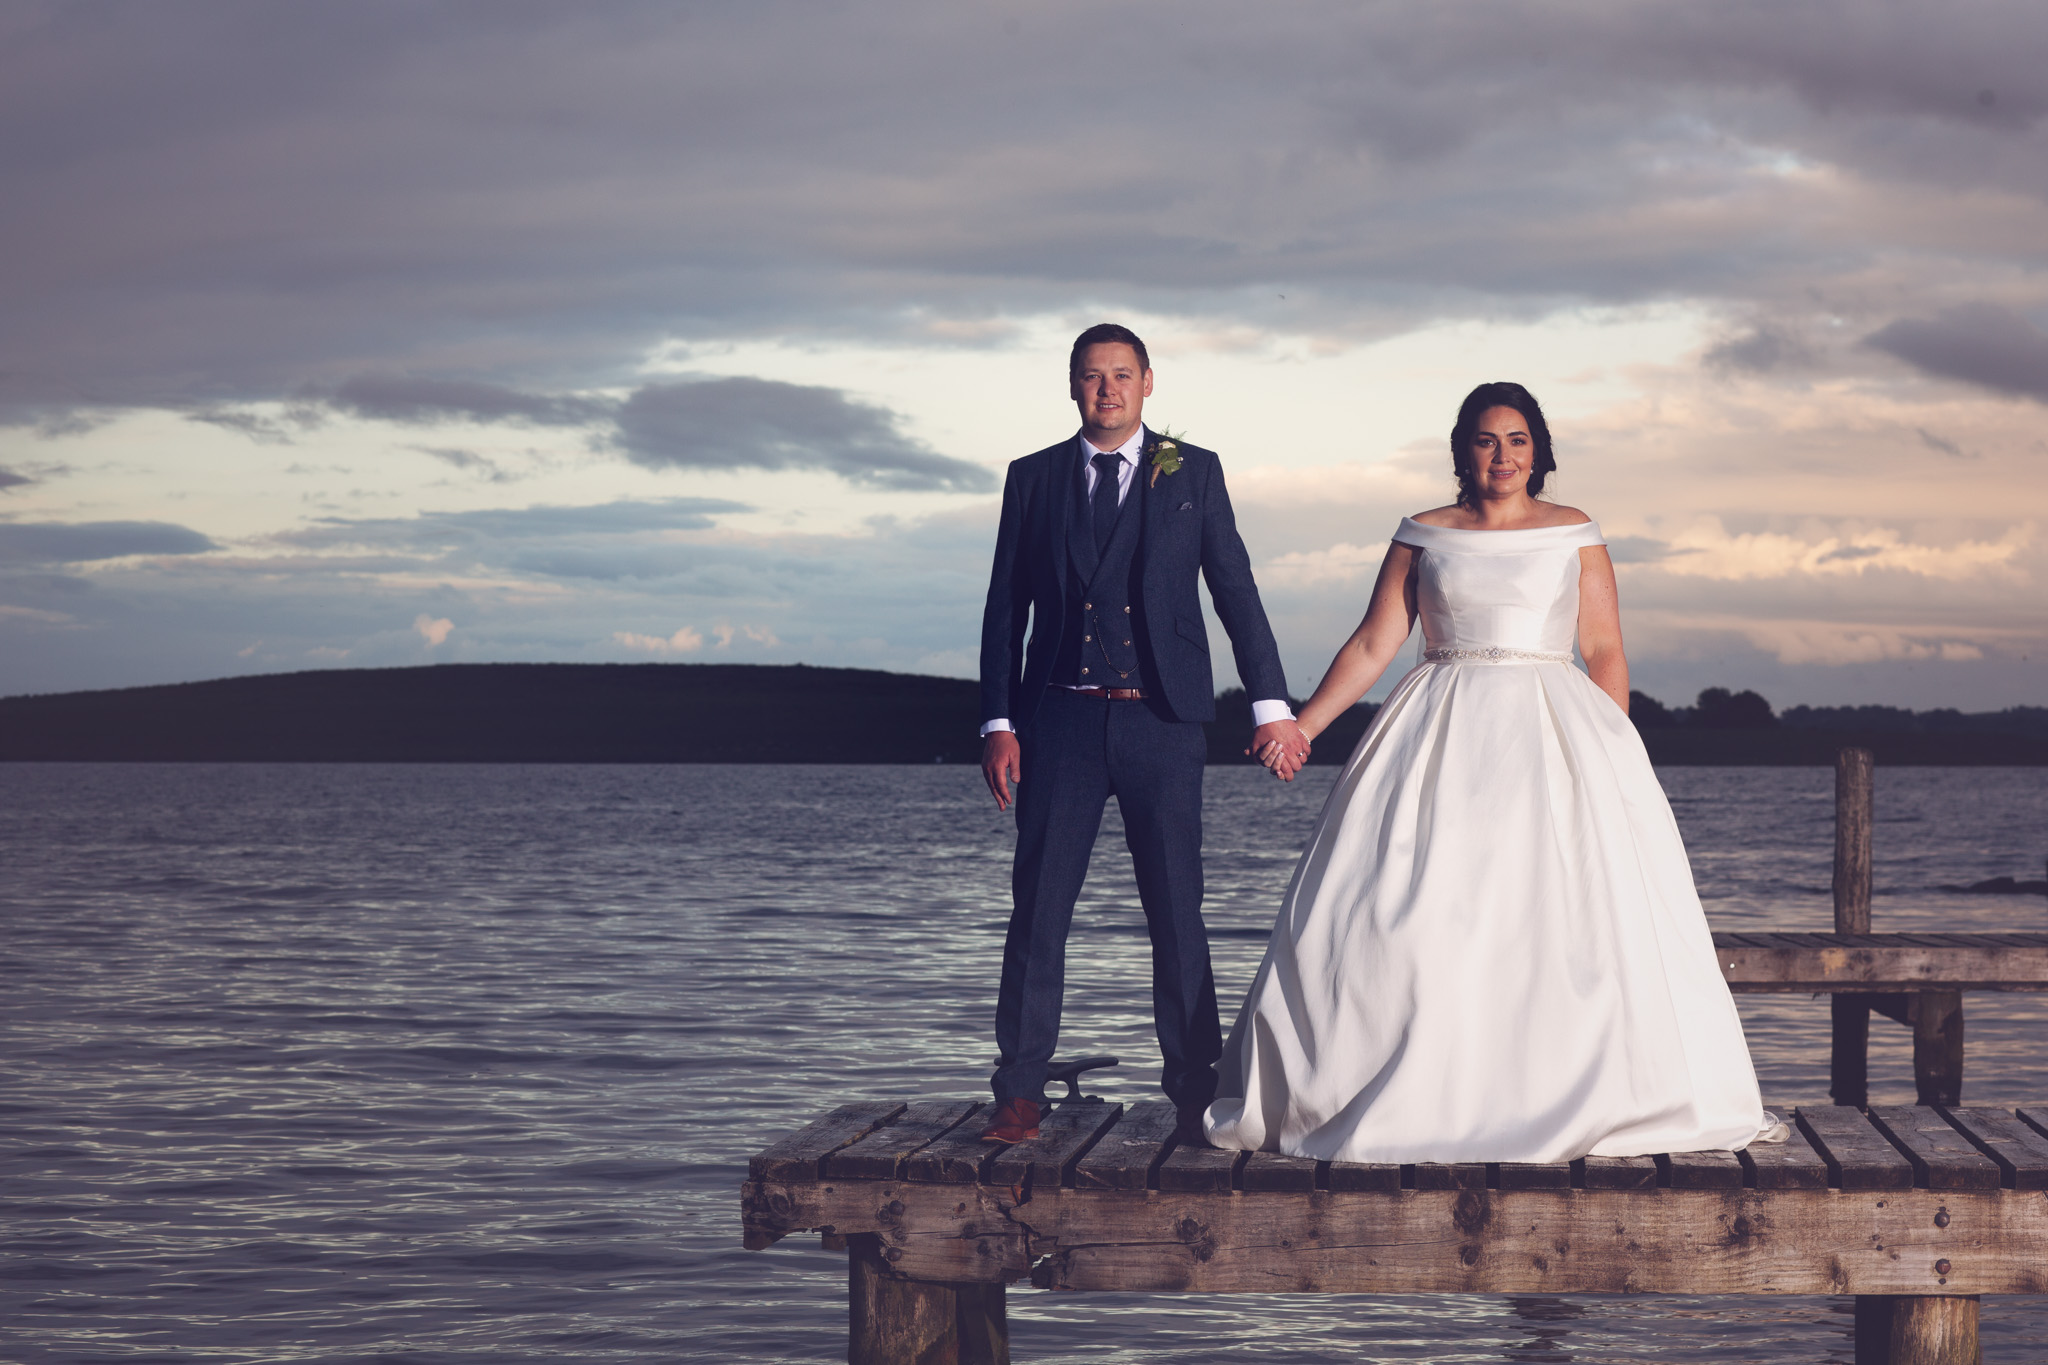 Mark_Barnes_Northern_Ireland_Wedding_Photography_Lusty_Beg_Wedding_Photography_Hayley&Brian-40.jpg